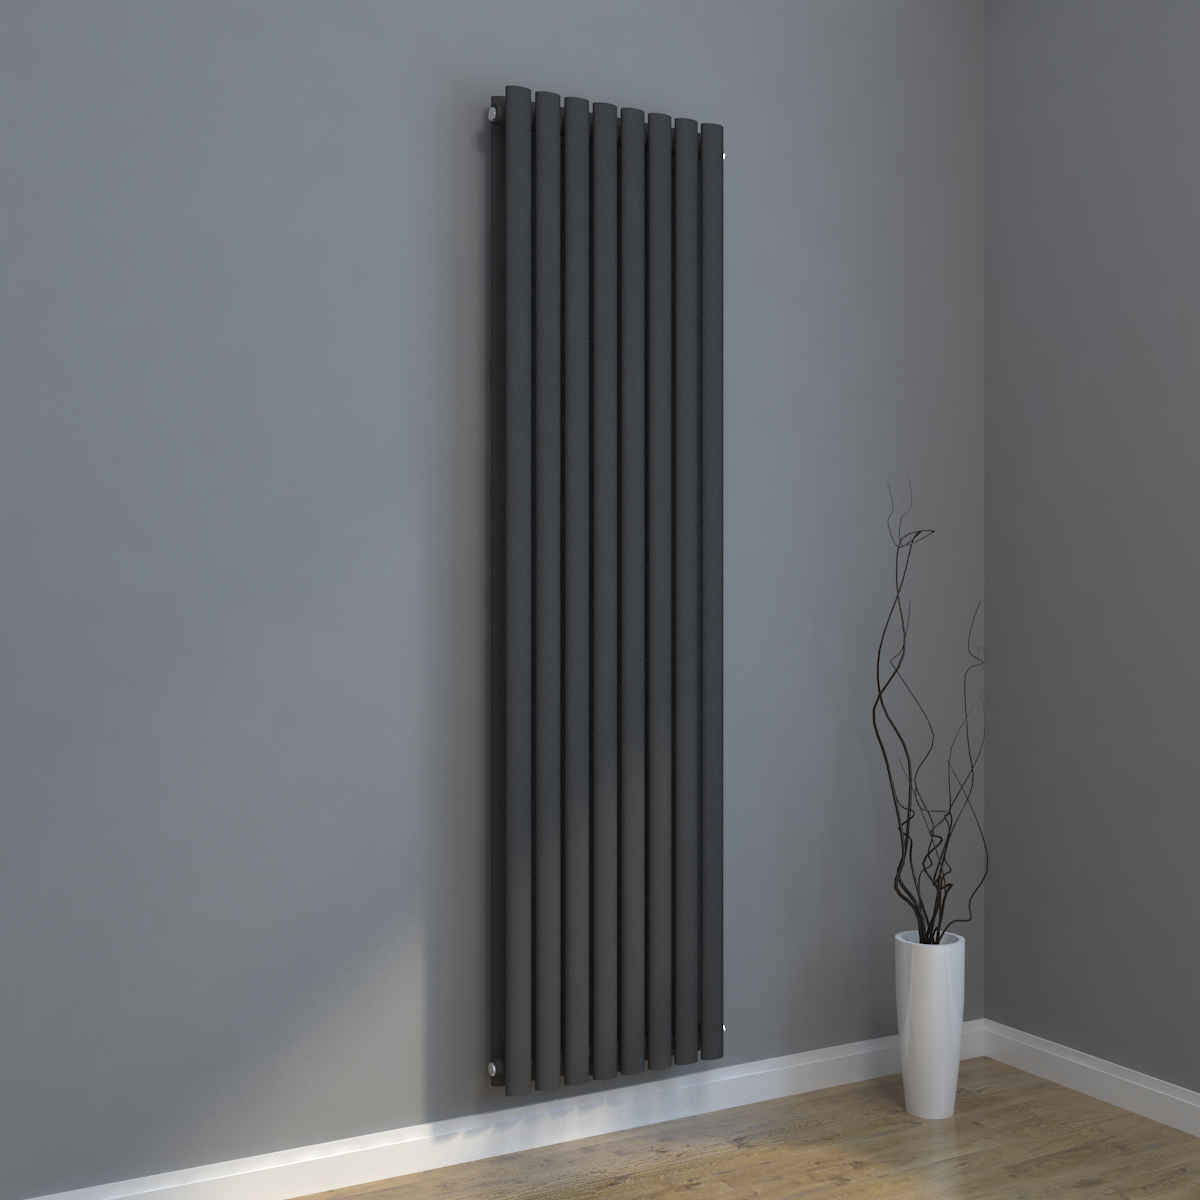 design r hren heizk rper vertikal mittelanschluss. Black Bedroom Furniture Sets. Home Design Ideas